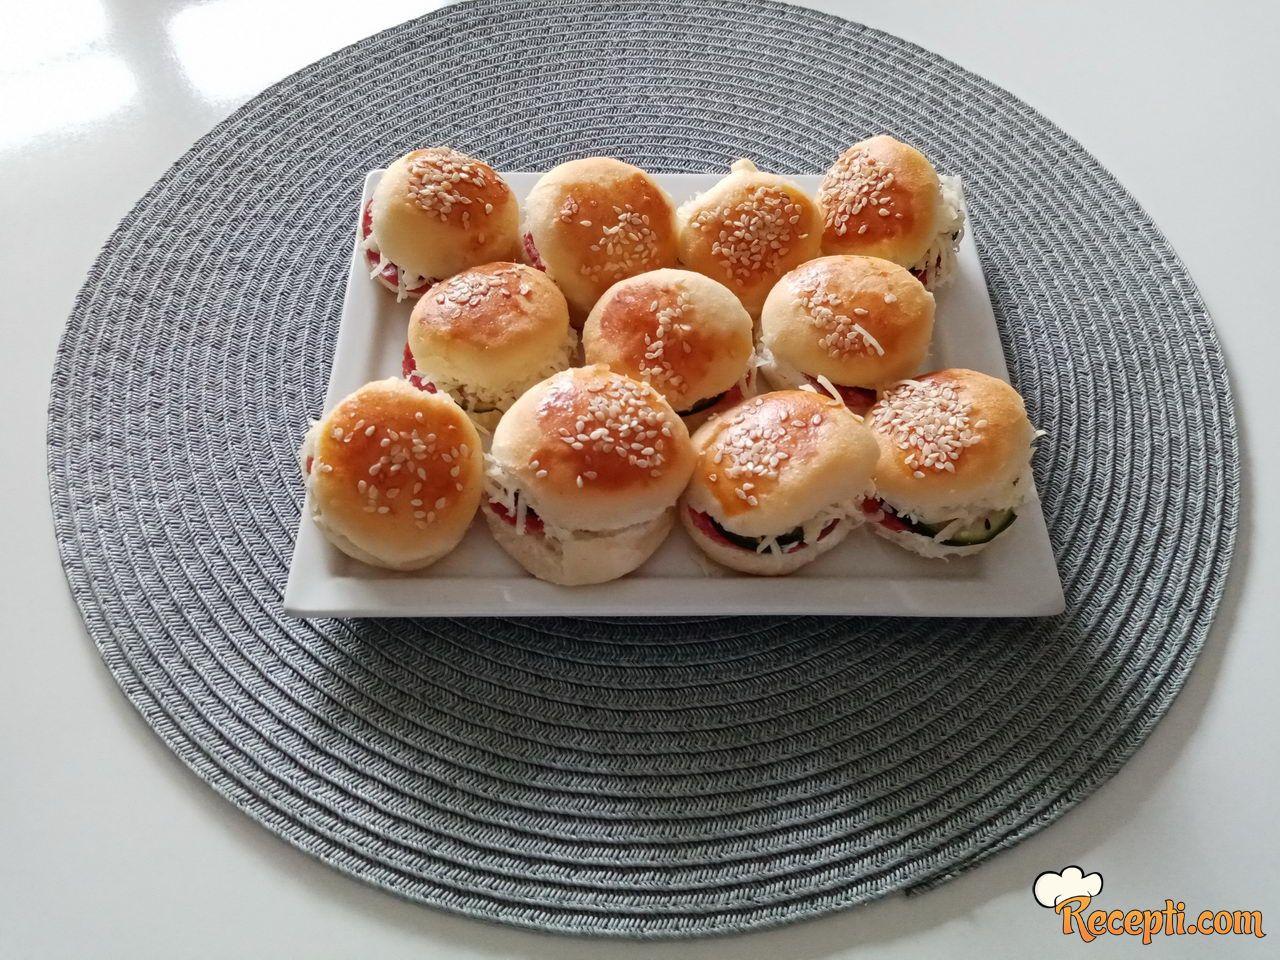 Rođendanski sendvičići